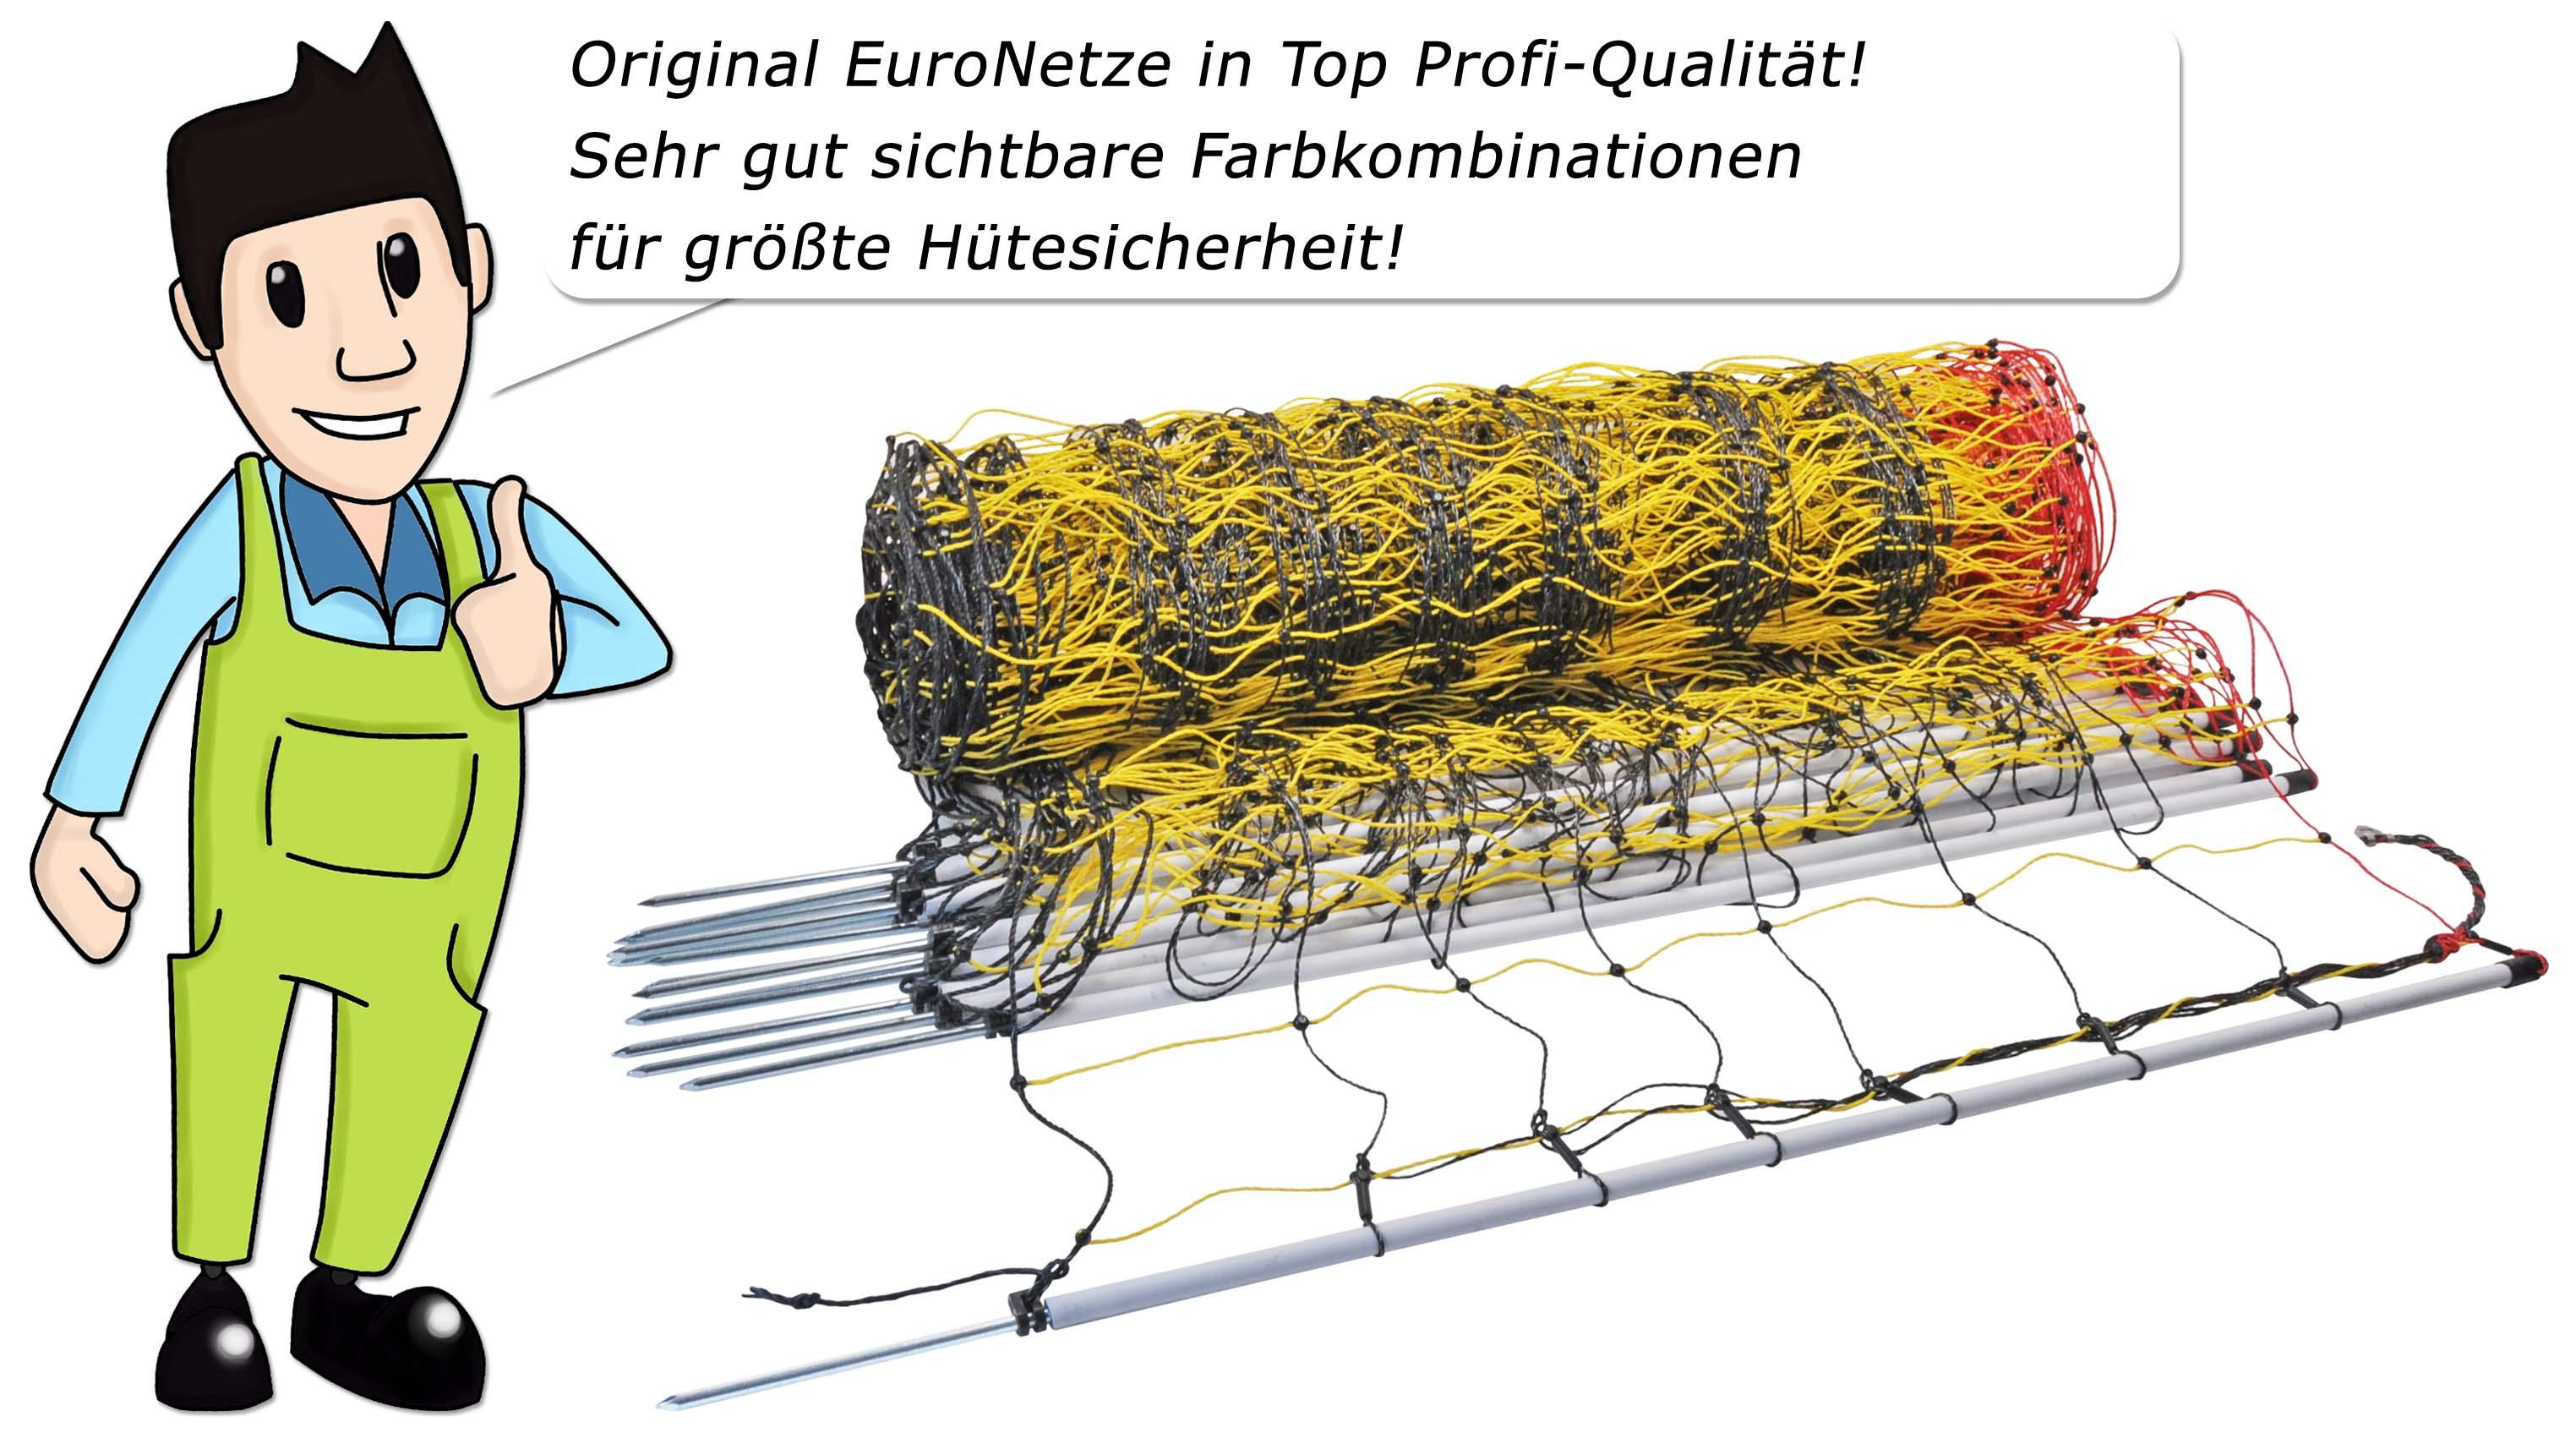 50m 90cm schafnetz euro netz zaun schaf zaun agility einz unung hundeschule ebay. Black Bedroom Furniture Sets. Home Design Ideas